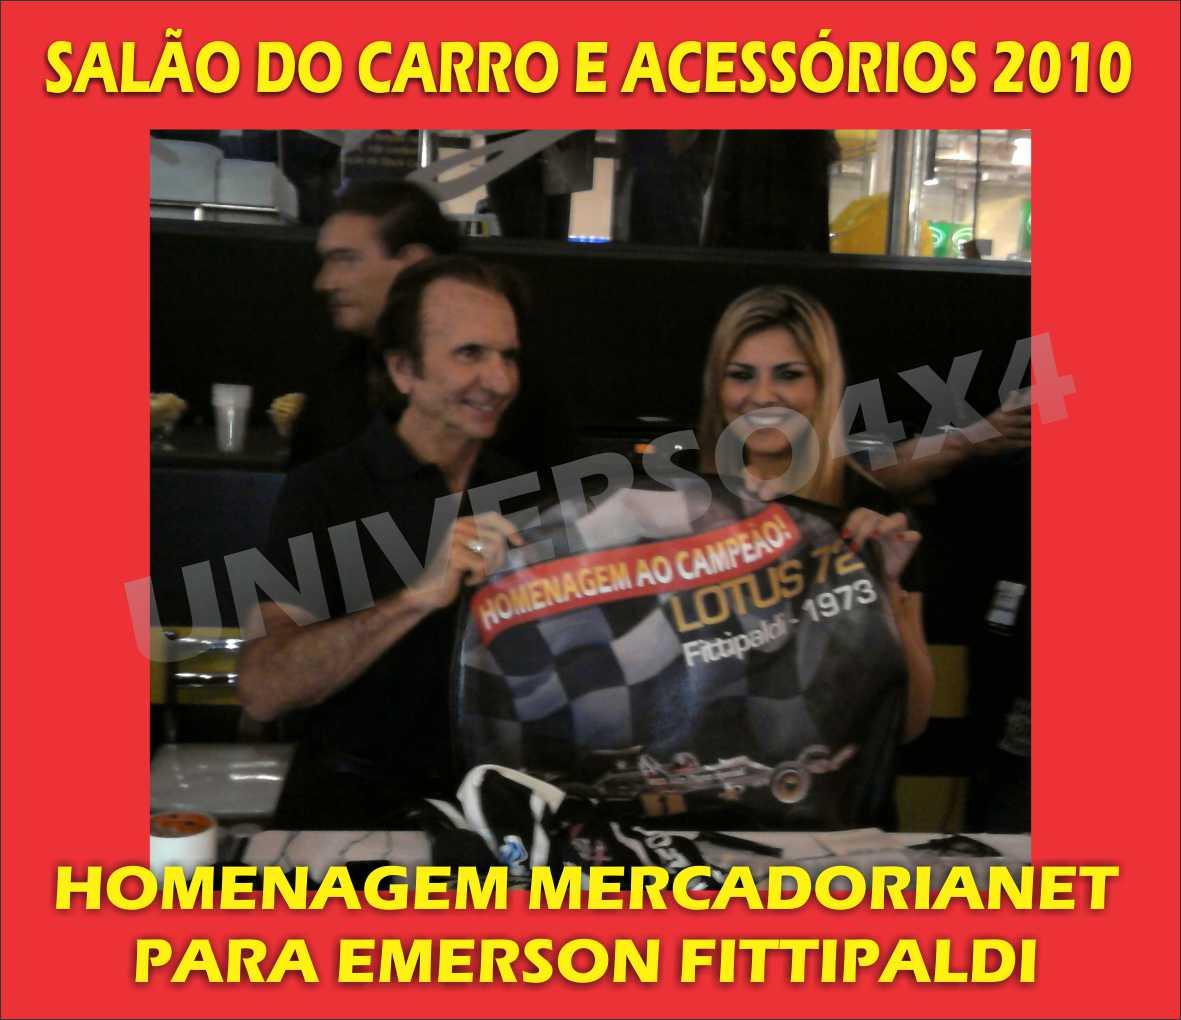 Capa Estepe Idea / Doblo Joaninha 3312